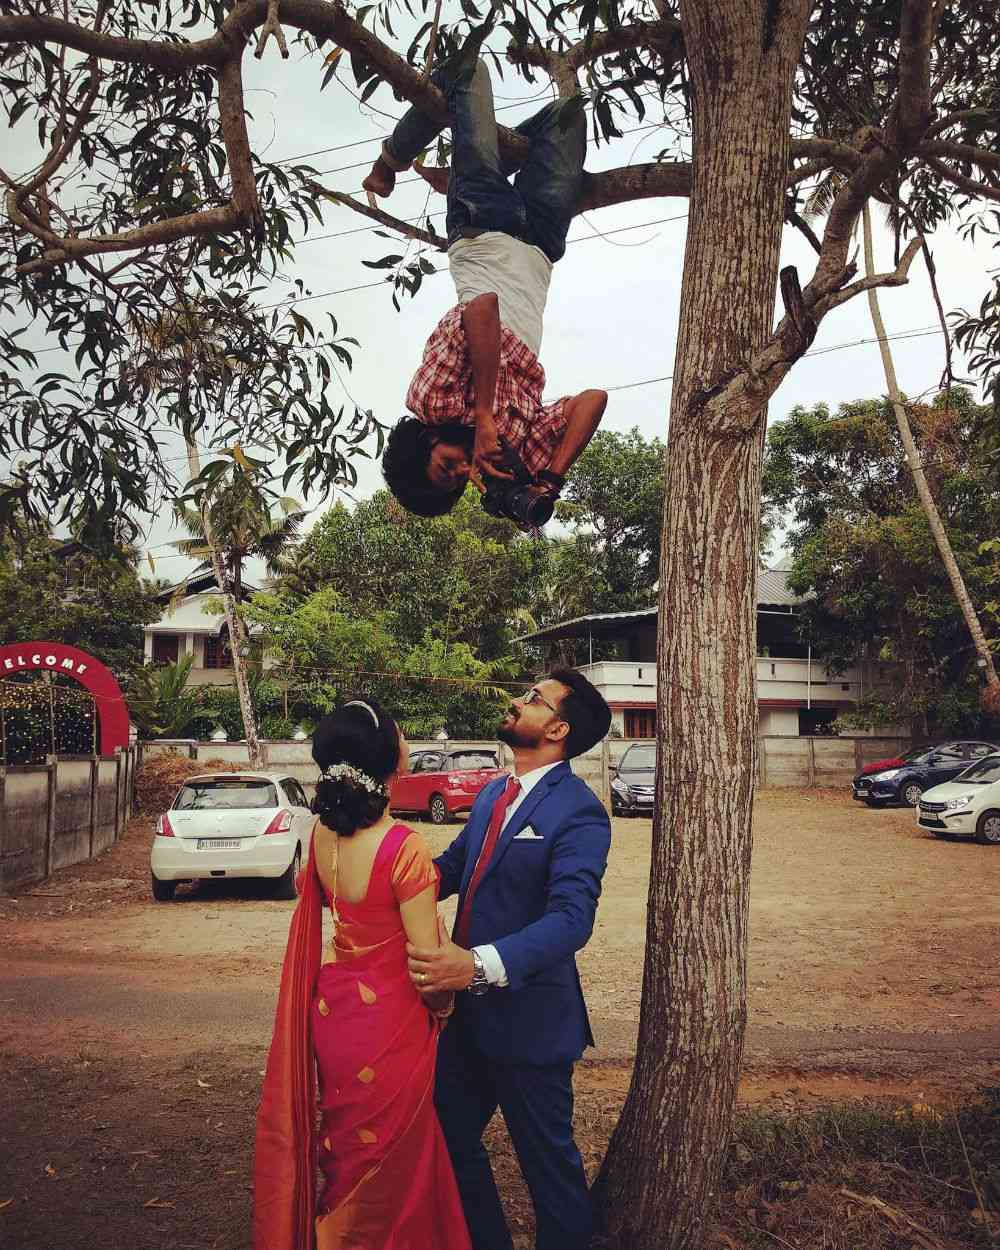 Vishnu hanging upside down to take a photo. Photo credit: Vishnu.